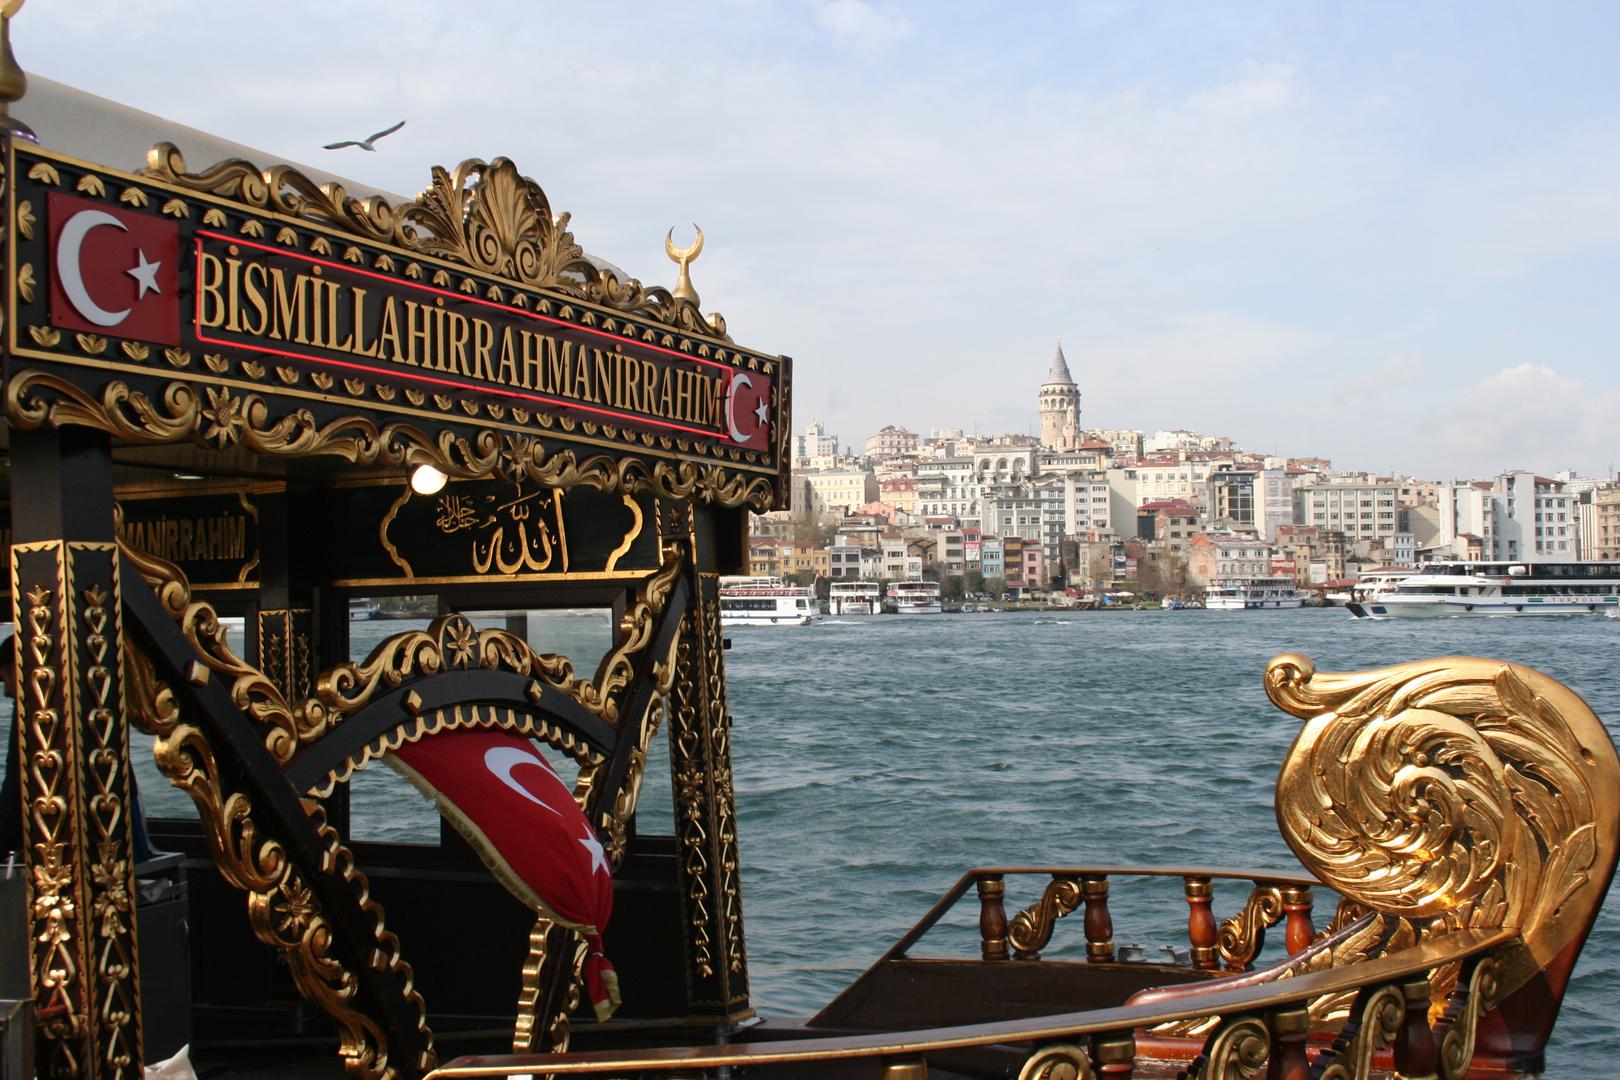 Am Bosporus / Istanbul